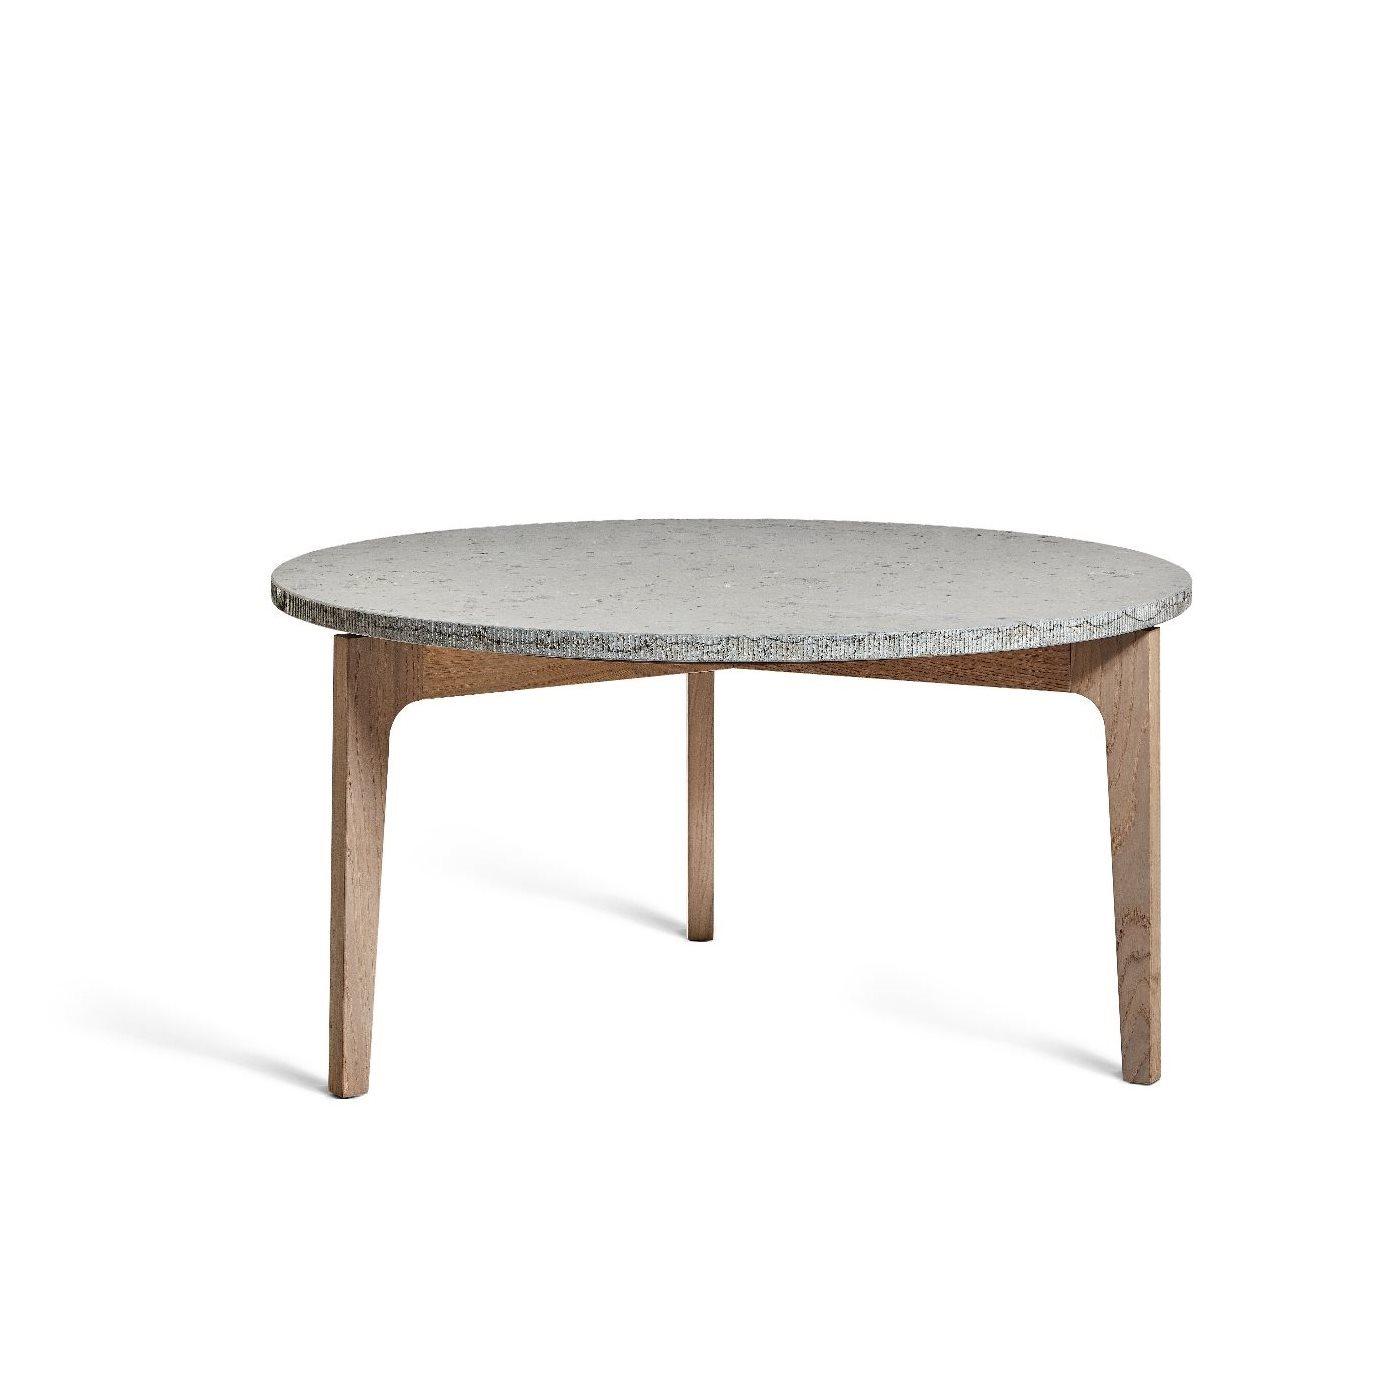 Höllviken soffbord ek/ kalksten, Mavis